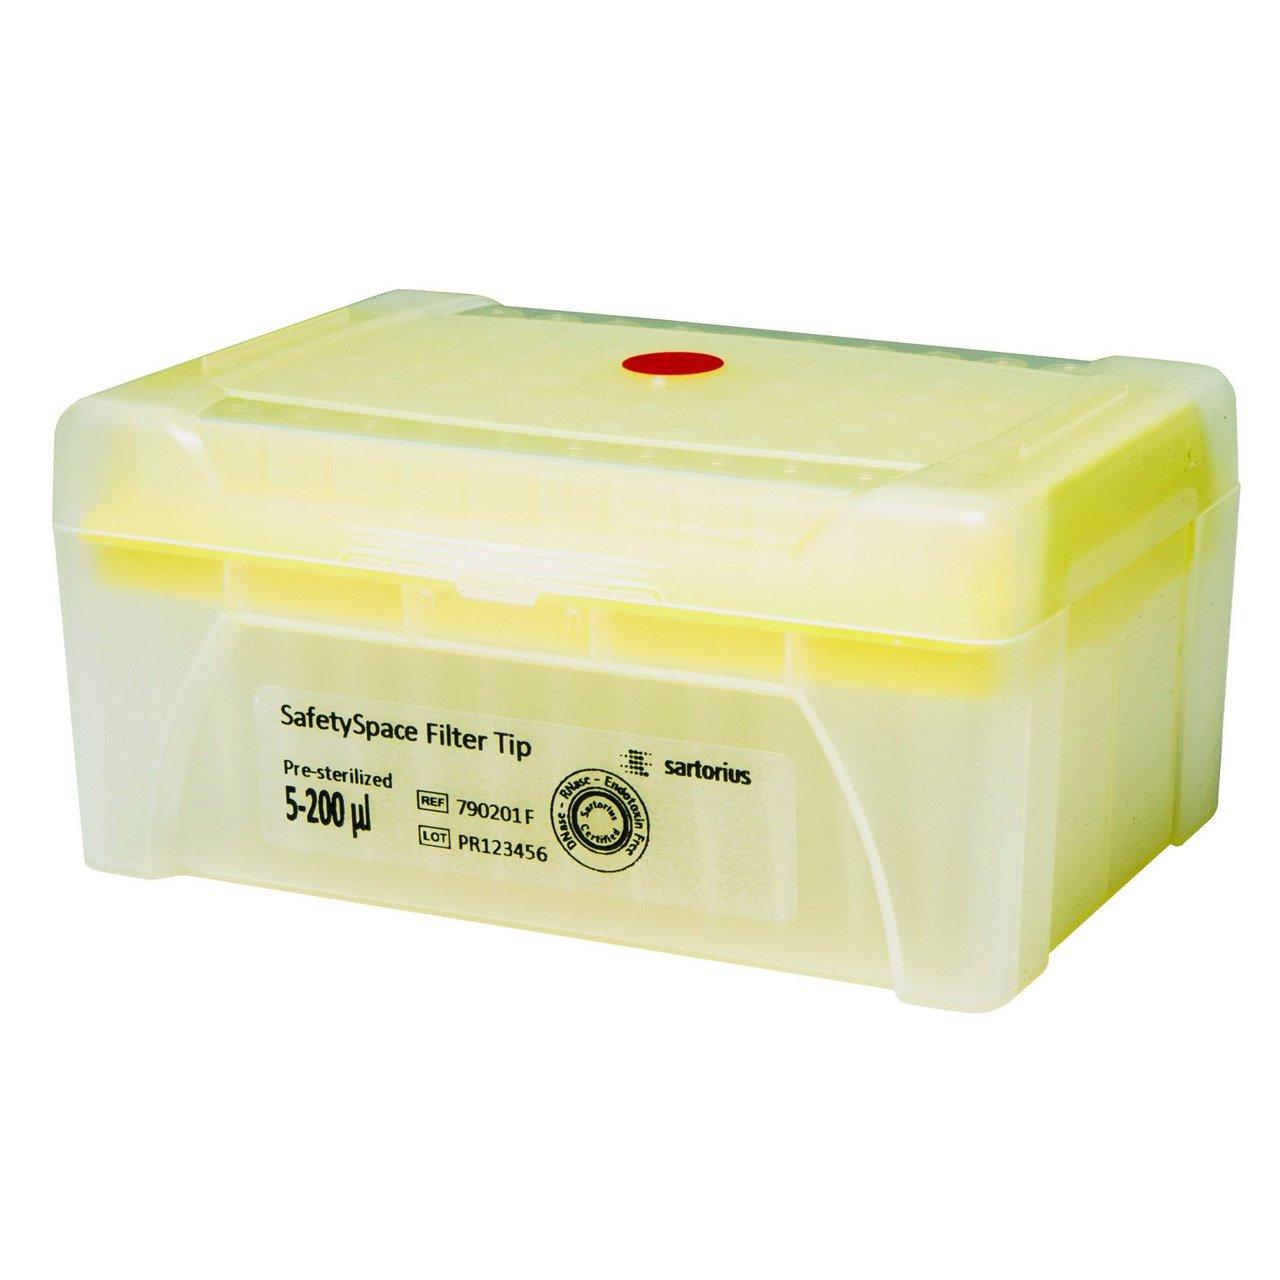 SafetySpace Filter Tip, 5-200 µl (10x96)